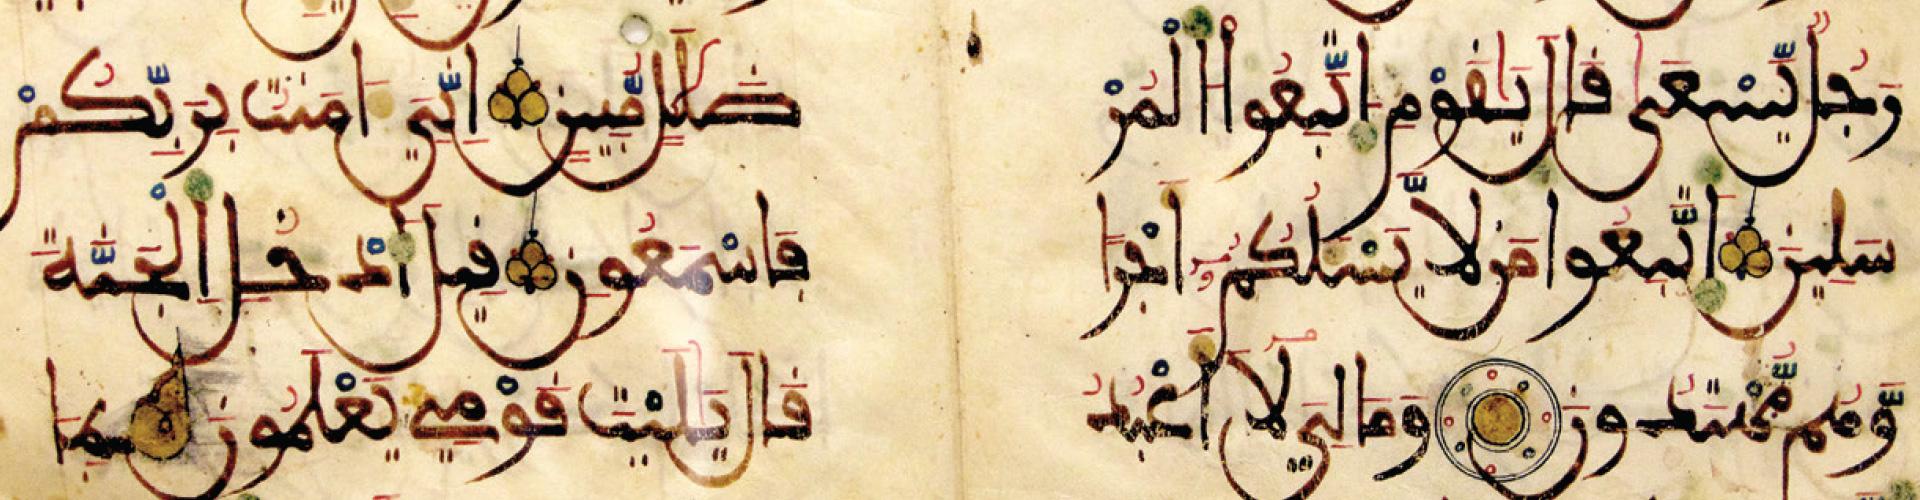 Rare Manuscript of Arabic Letters